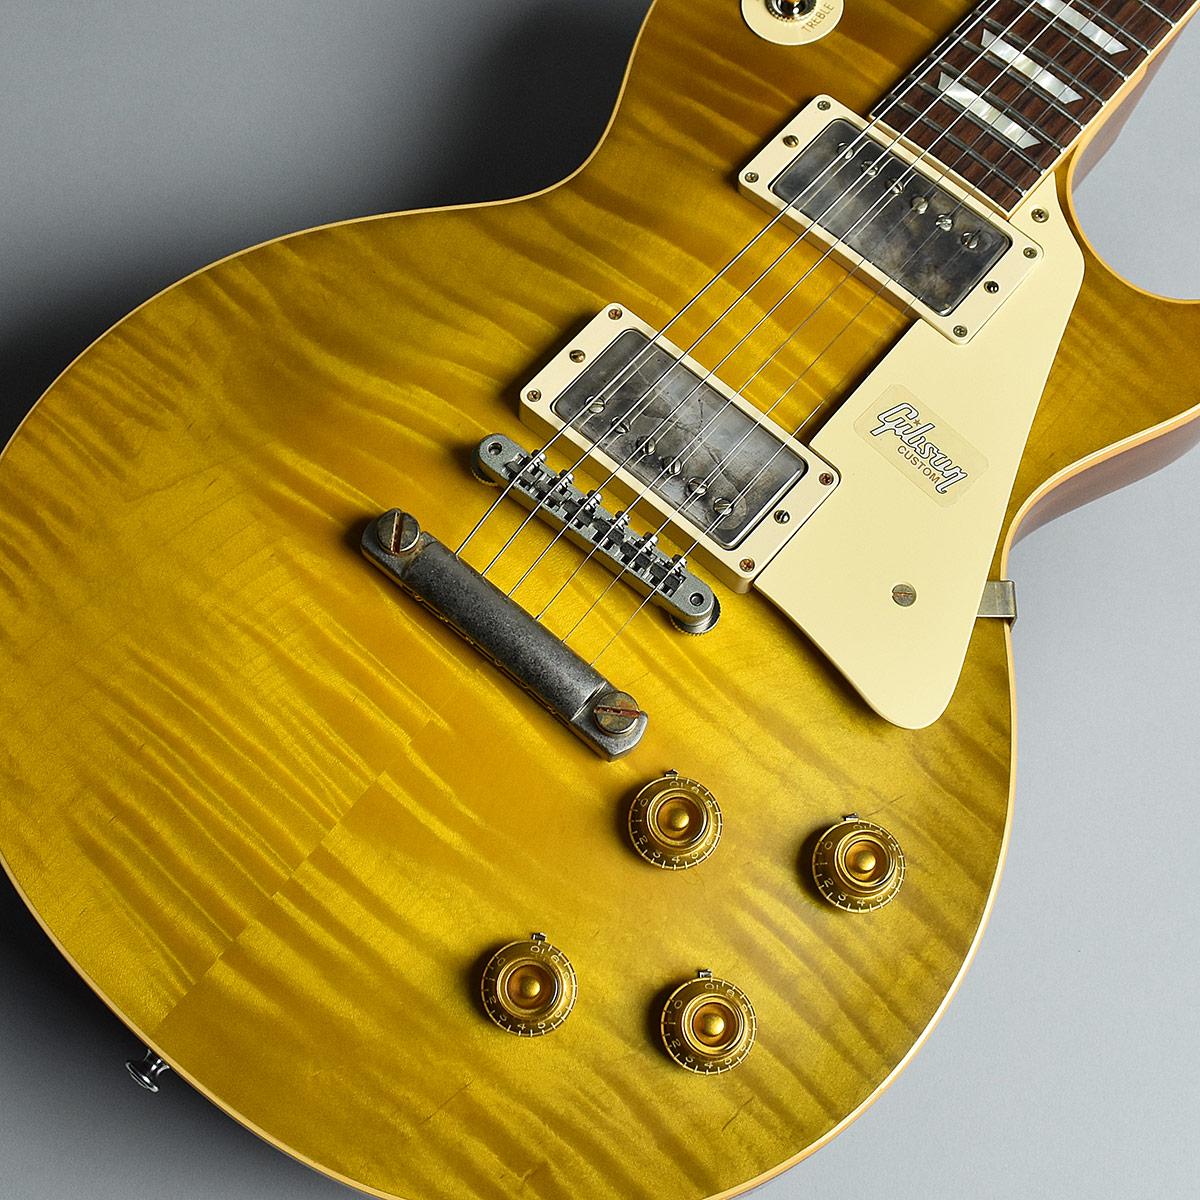 Gibson Custom Shop 1959 Les Paul Standard VOS Danger Burst S/N:971642 レスポール・スタンダード 【ギブソン カスタムショップ】【未展示品】